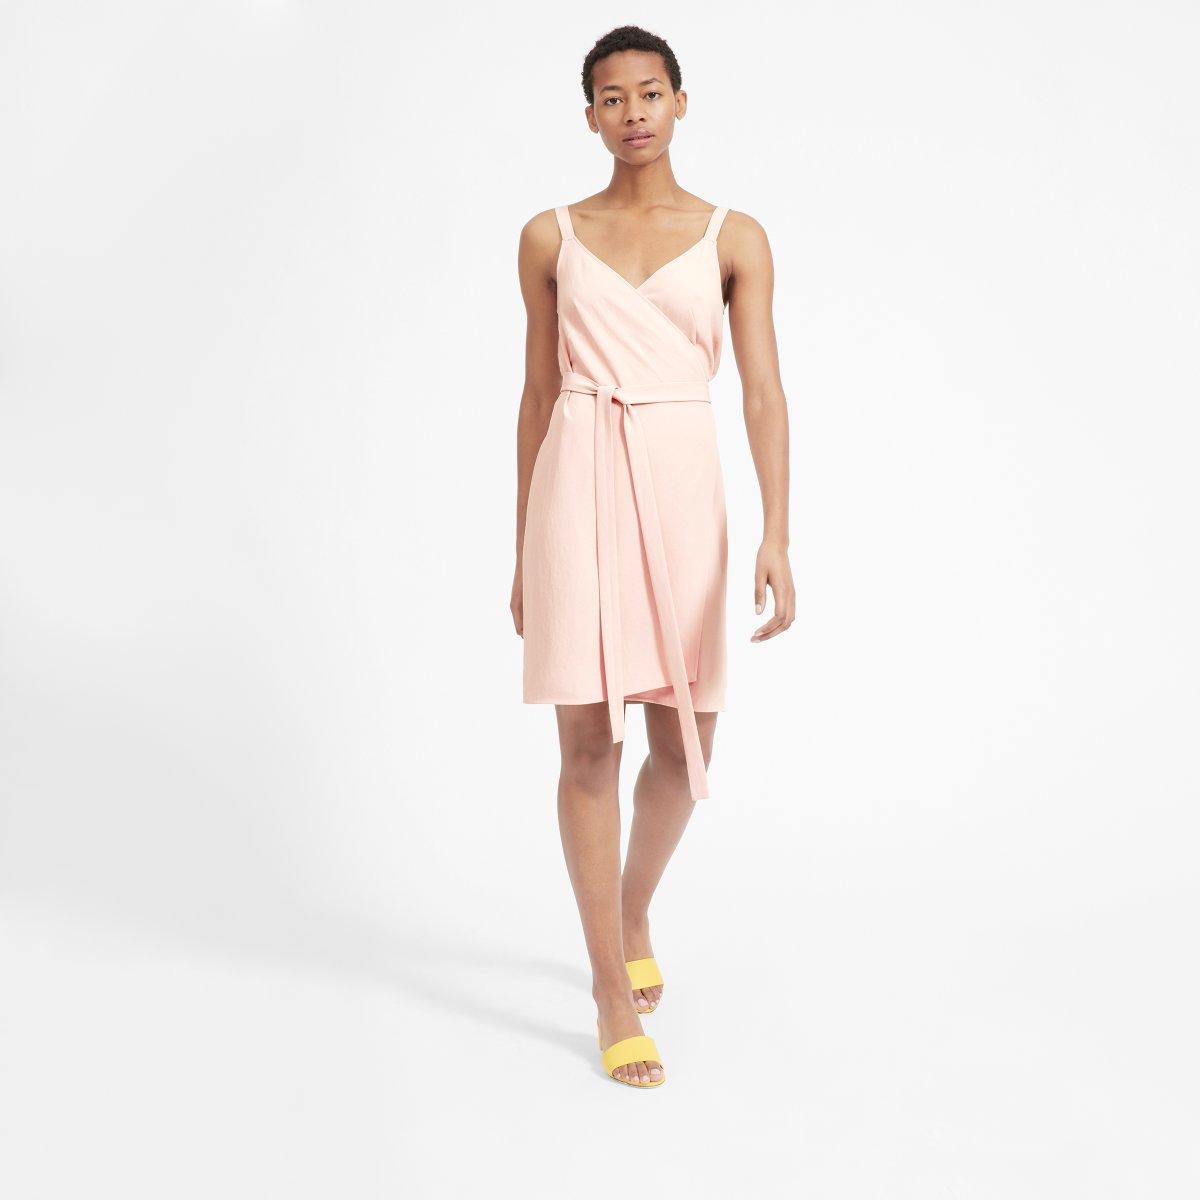 Everlane Choose What You Pay / Rose Wrap Dress - Sunshine Style, A Florida Based Fashion Blog